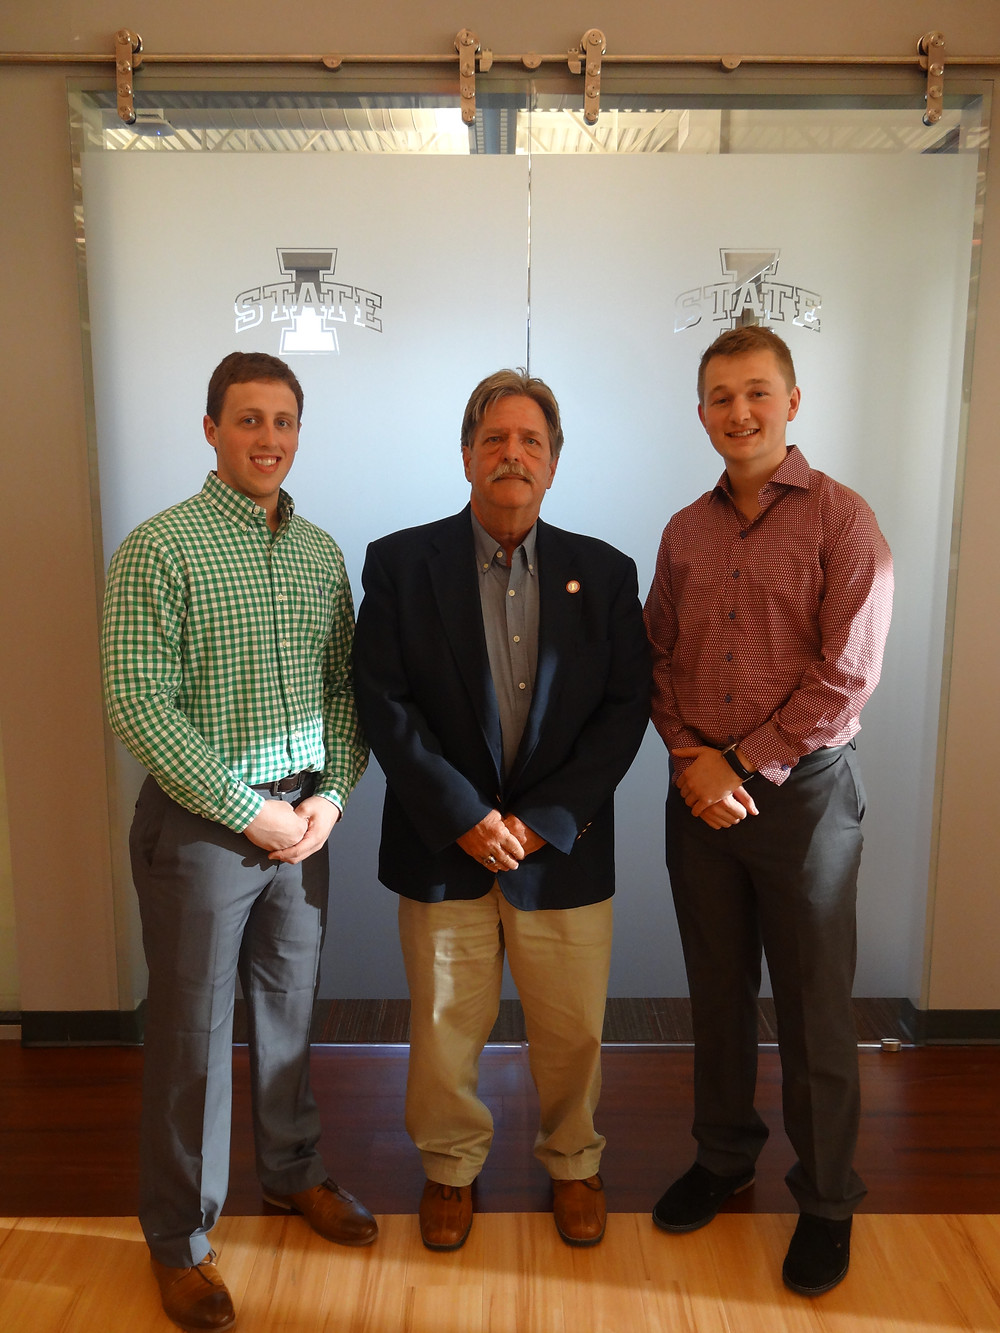 Josh Zabel, Bill Watkins, & Michael Montgomery